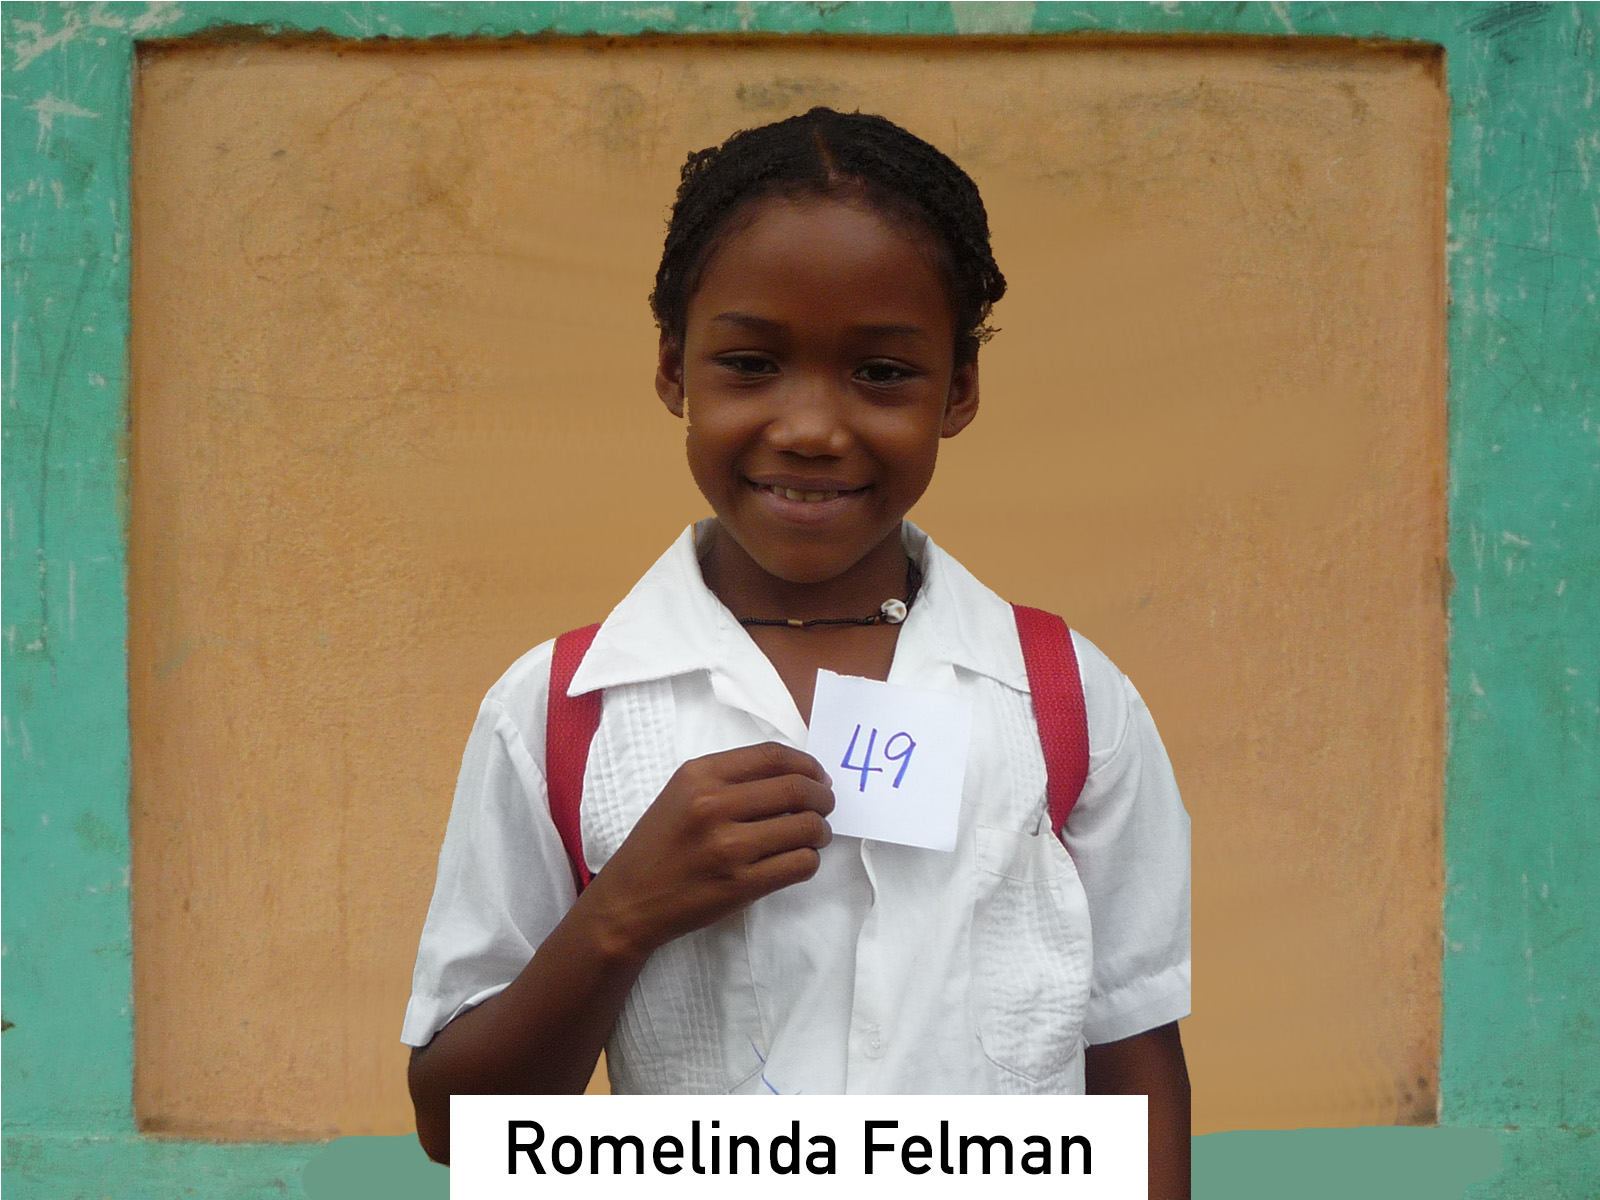 049 - Romelinda Felman.jpg